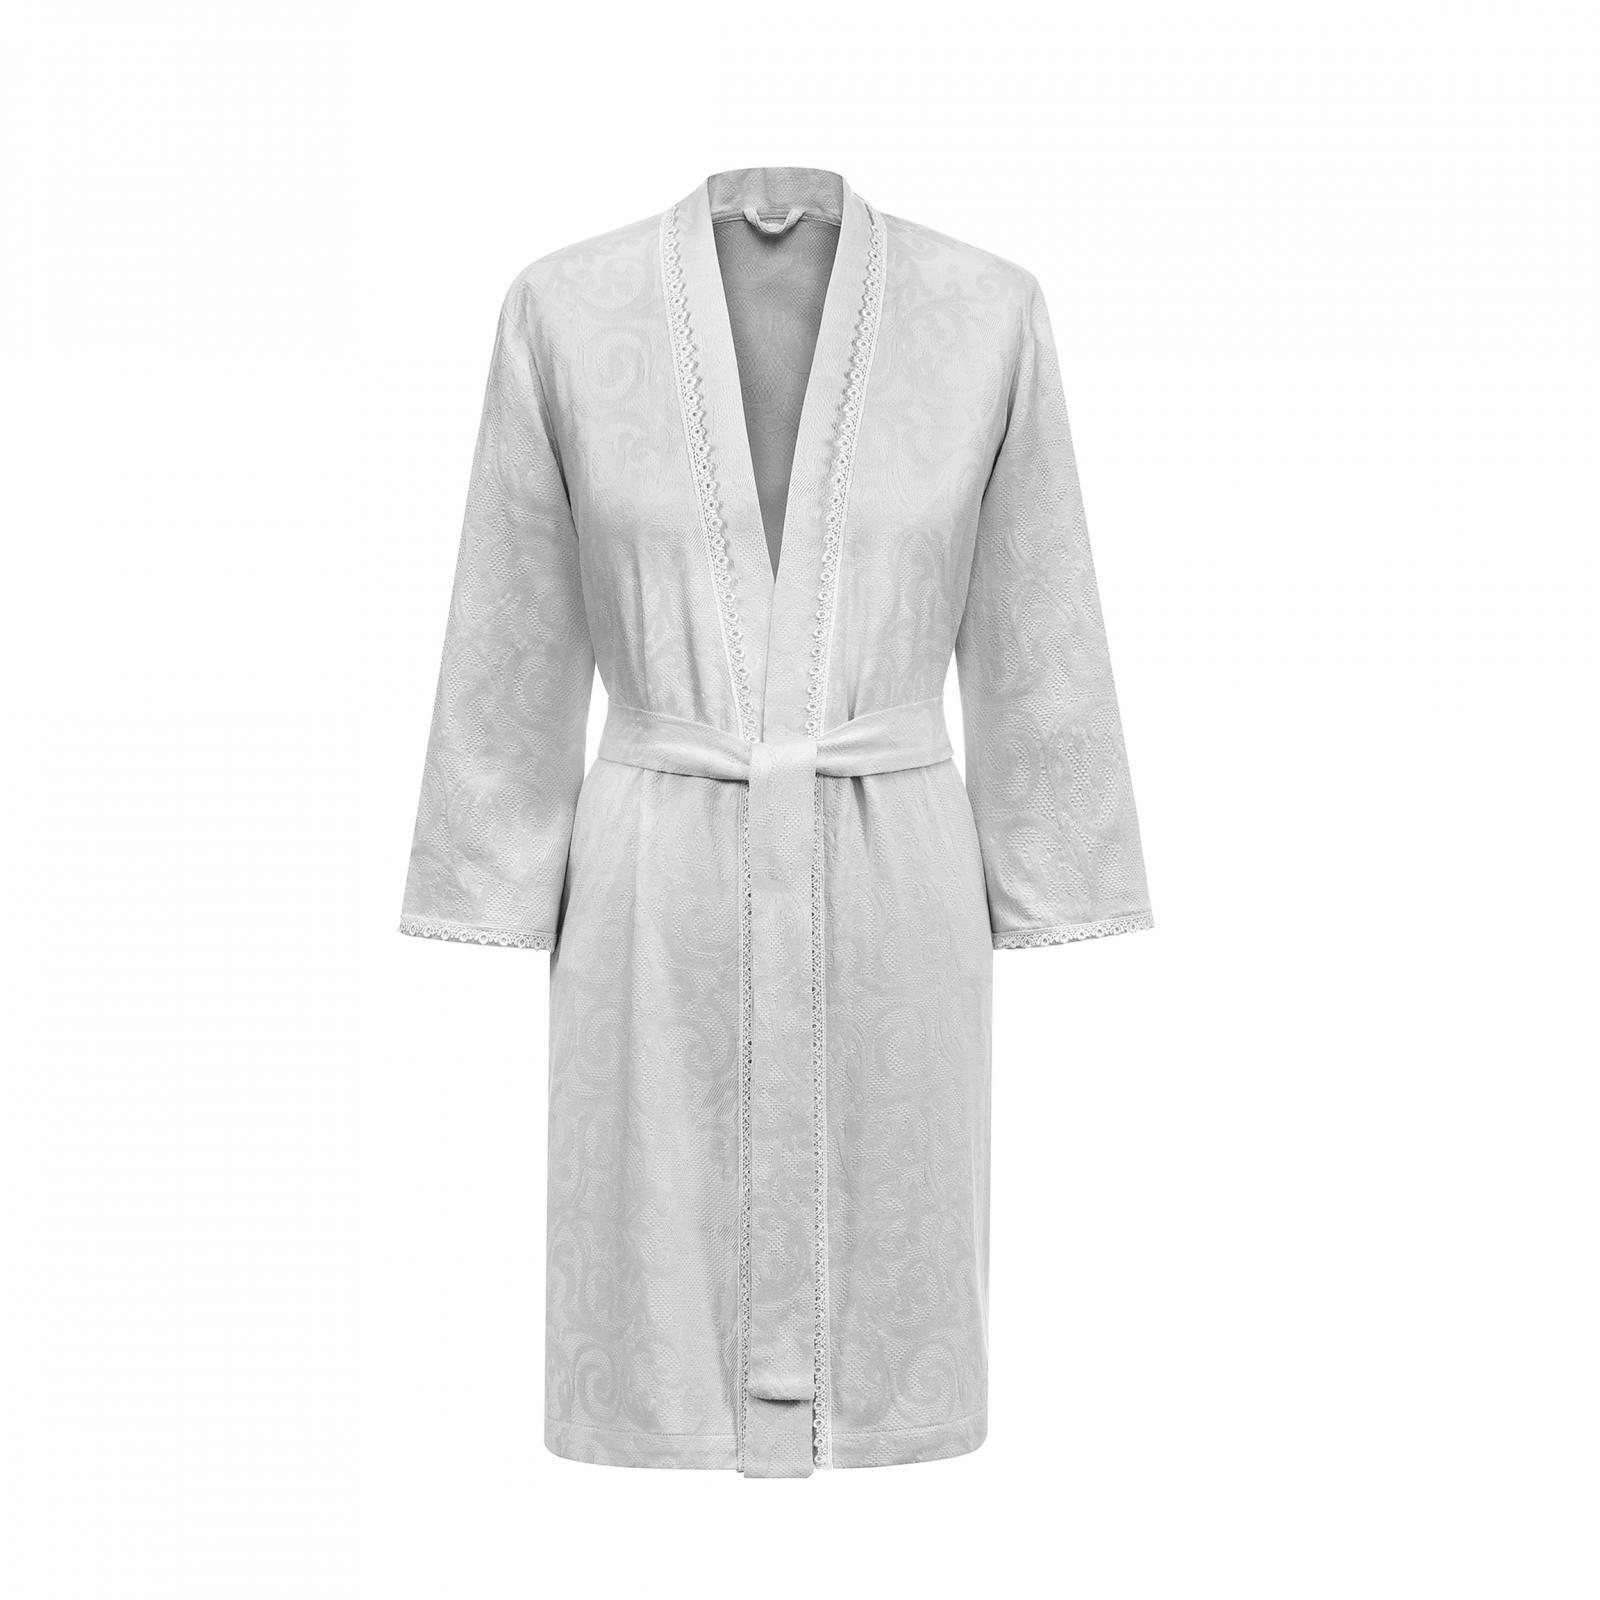 Фото - Халат Togas Дорис серый xl /50/ коврик для ванной togas дорис розовое 60x90